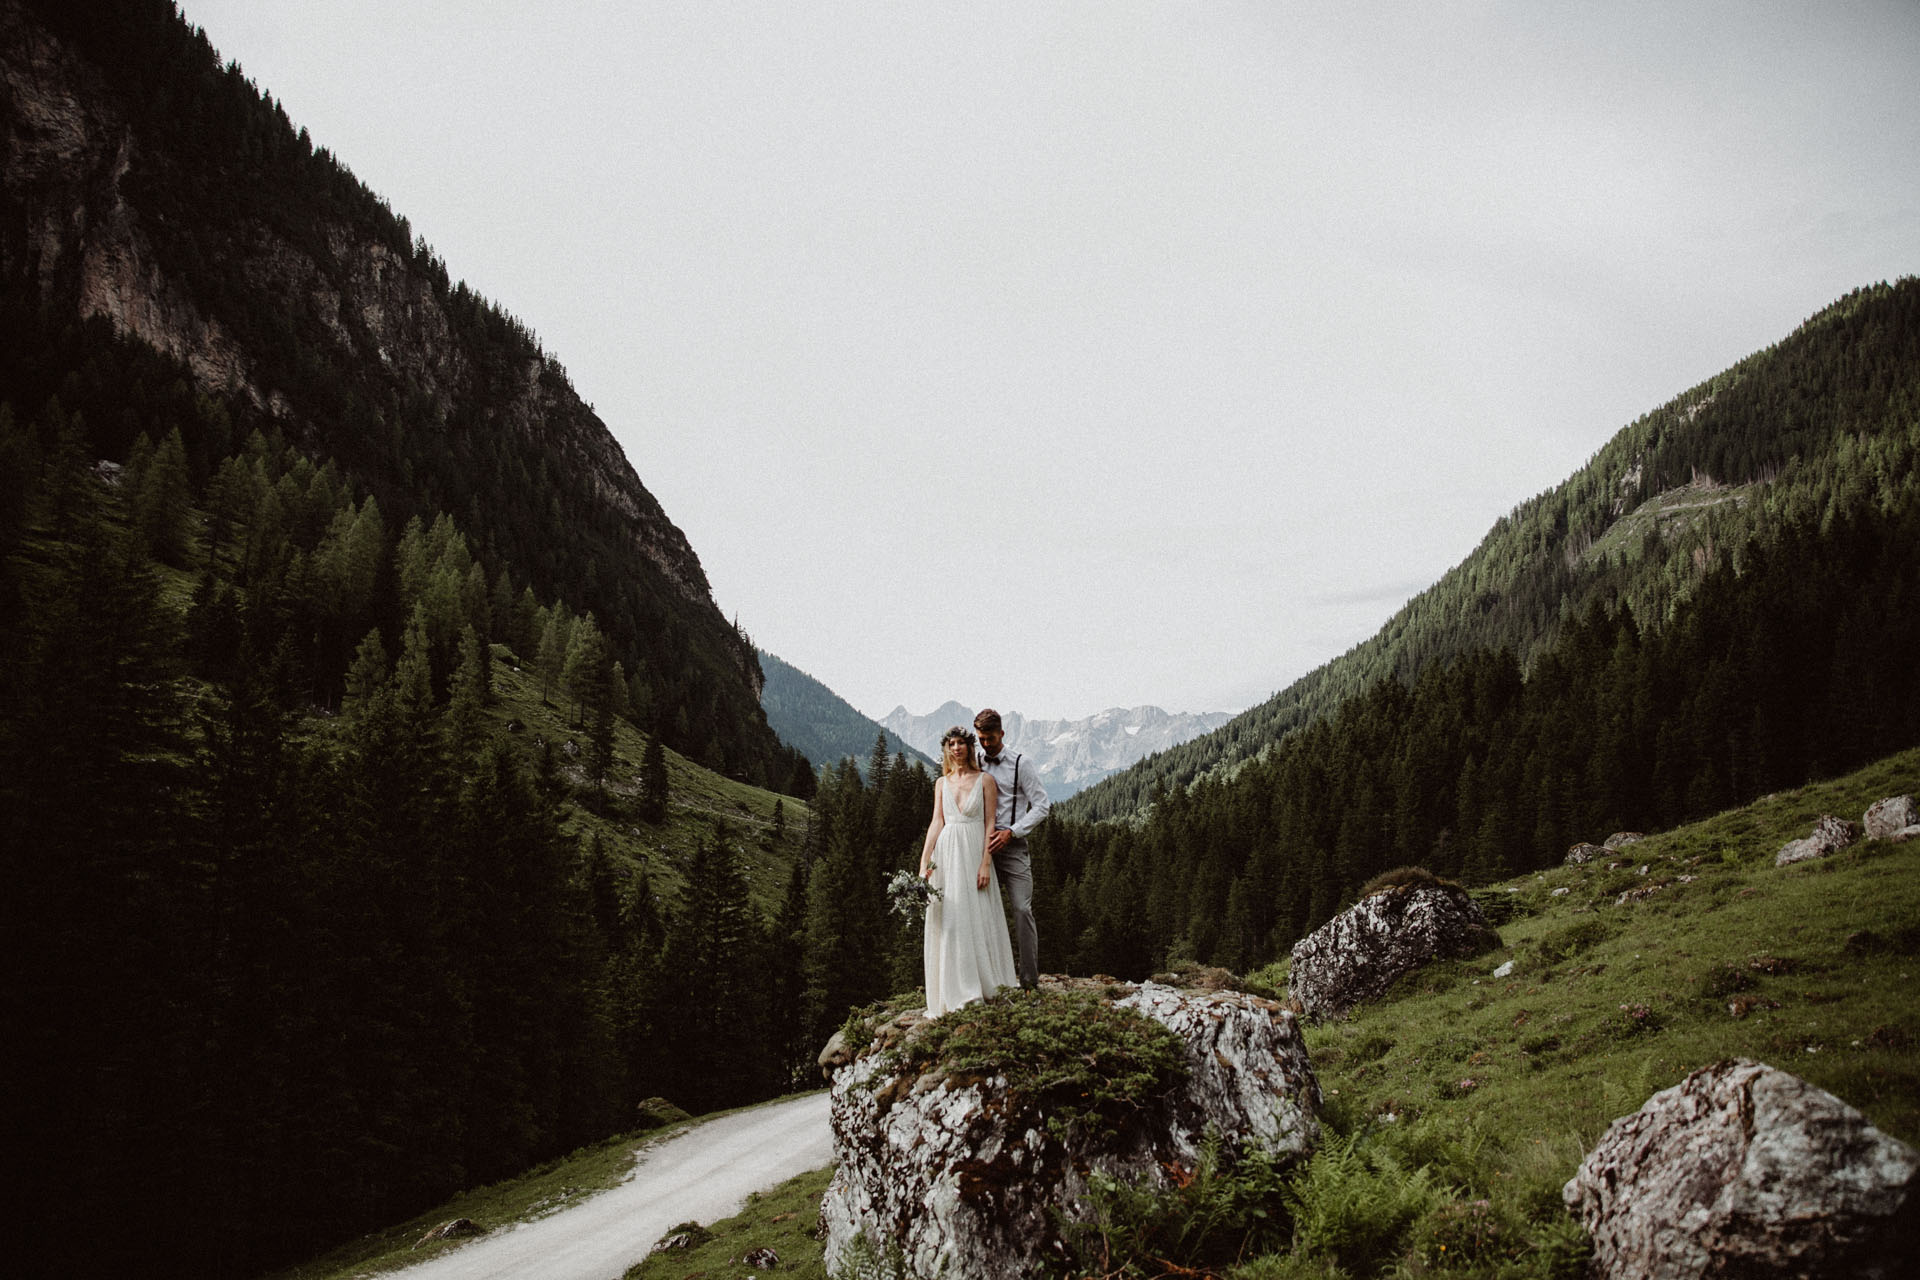 vienna-wedding-photographer-agnesundandi-weddingshooting-schladming-35